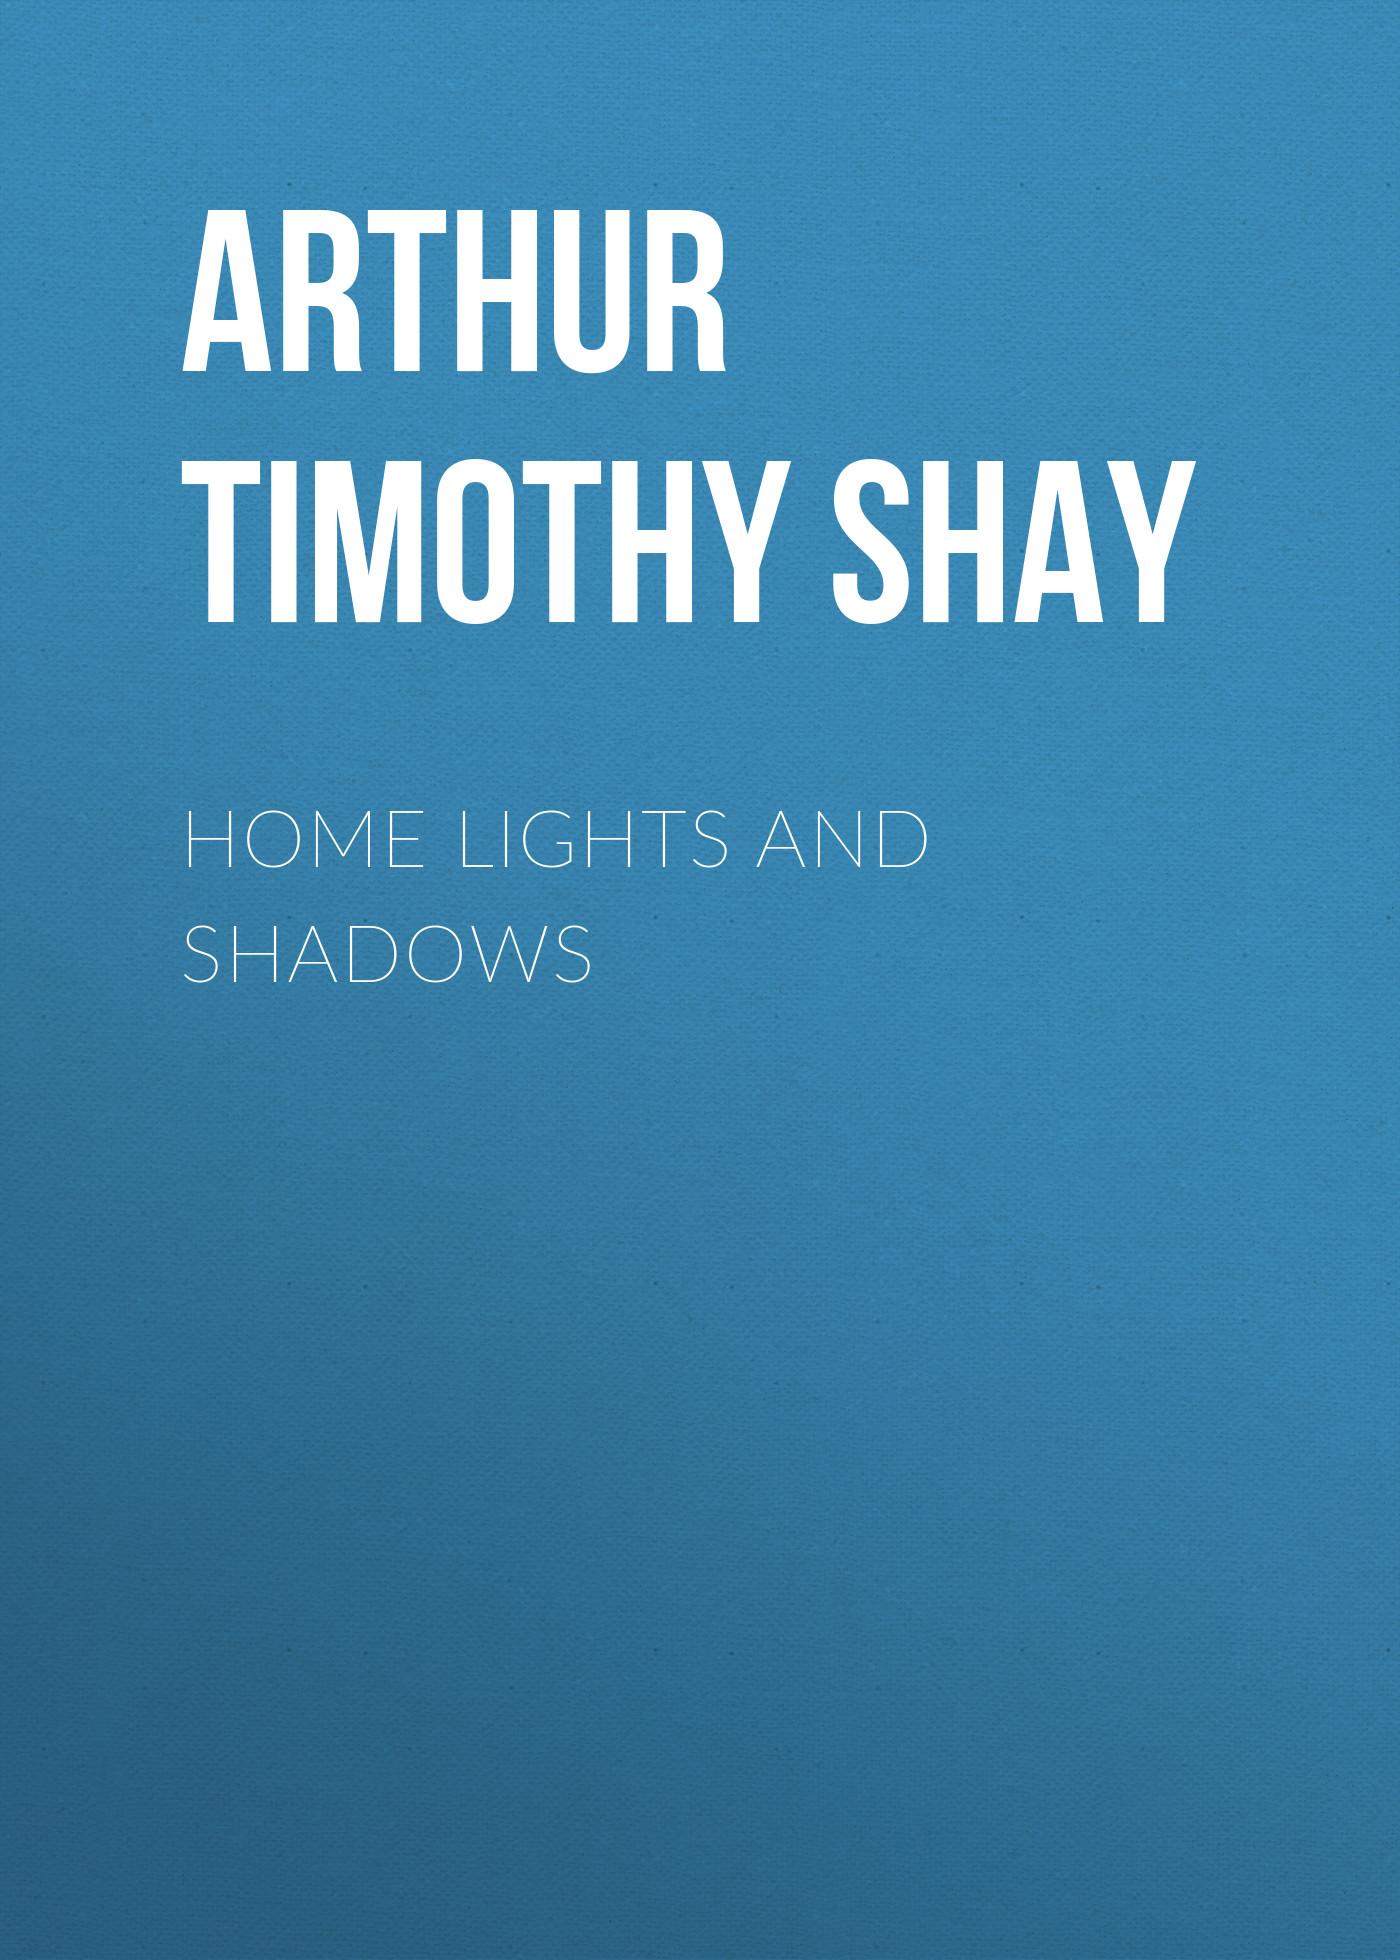 Arthur Timothy Shay Home Lights and Shadows цена в Москве и Питере